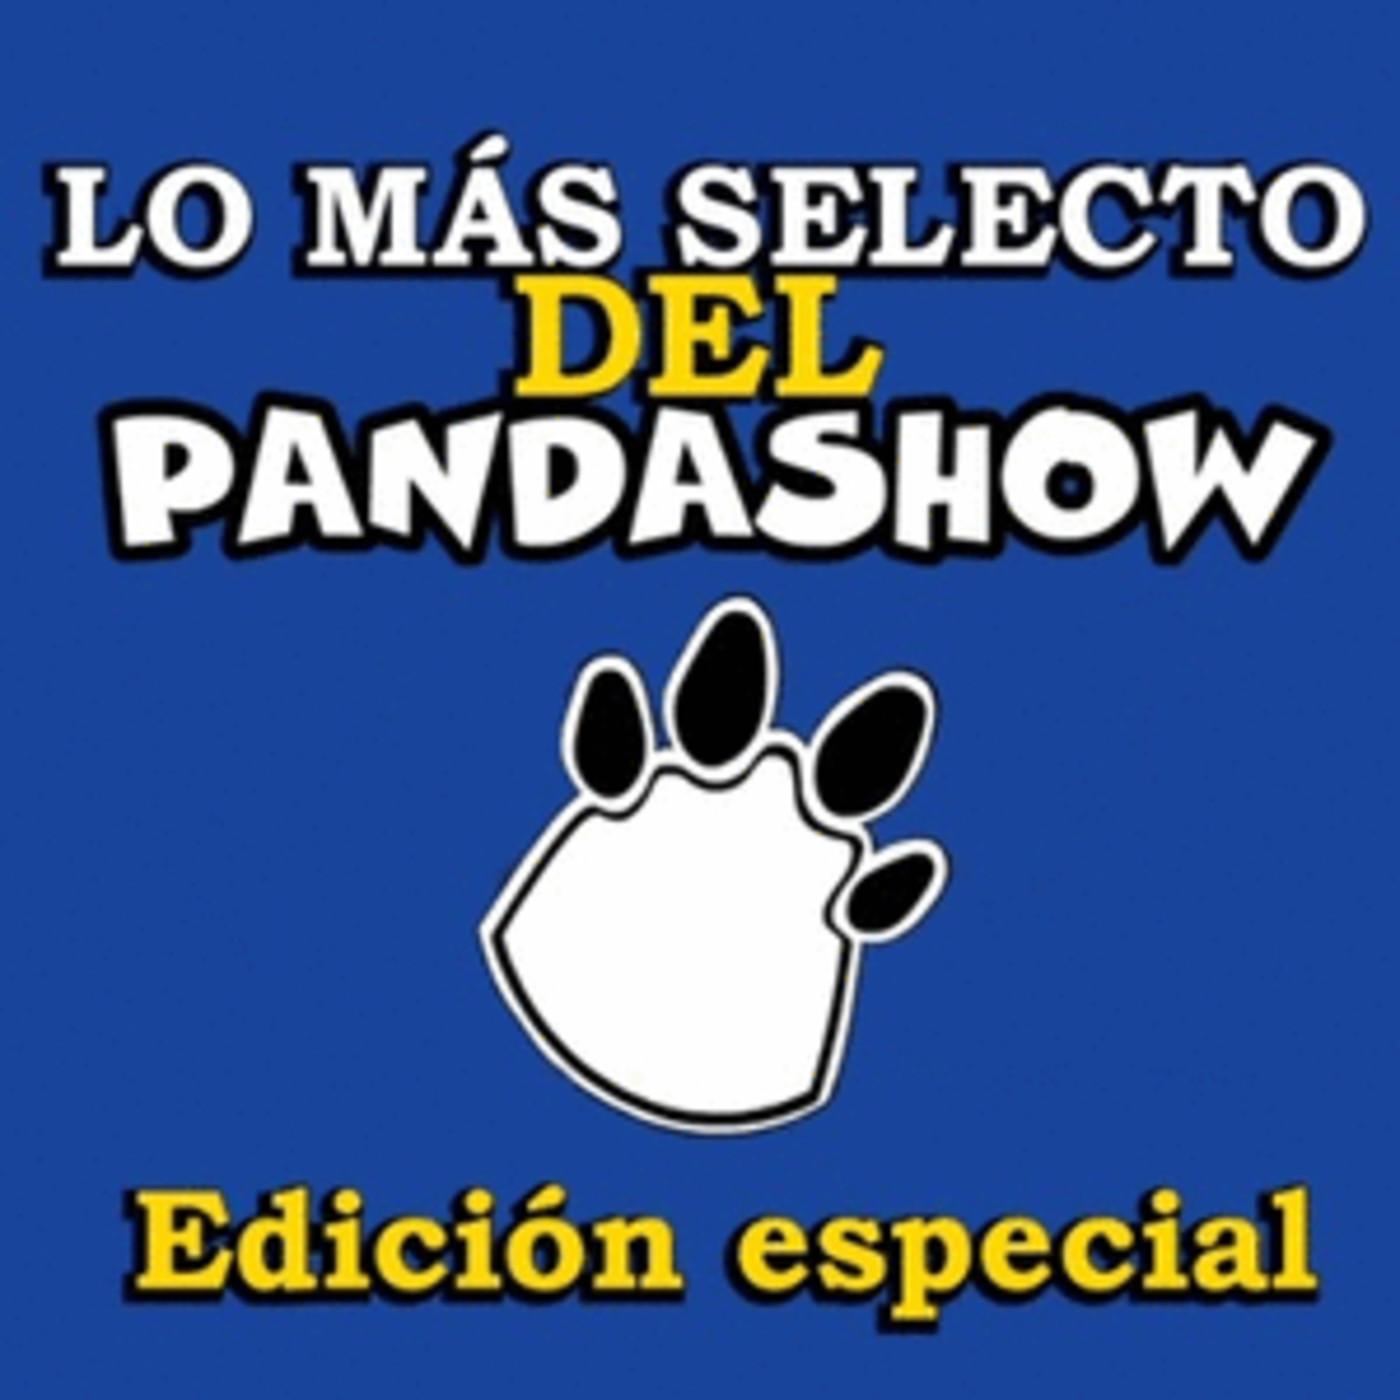 Dating for sex: panda biggs em directo online dating